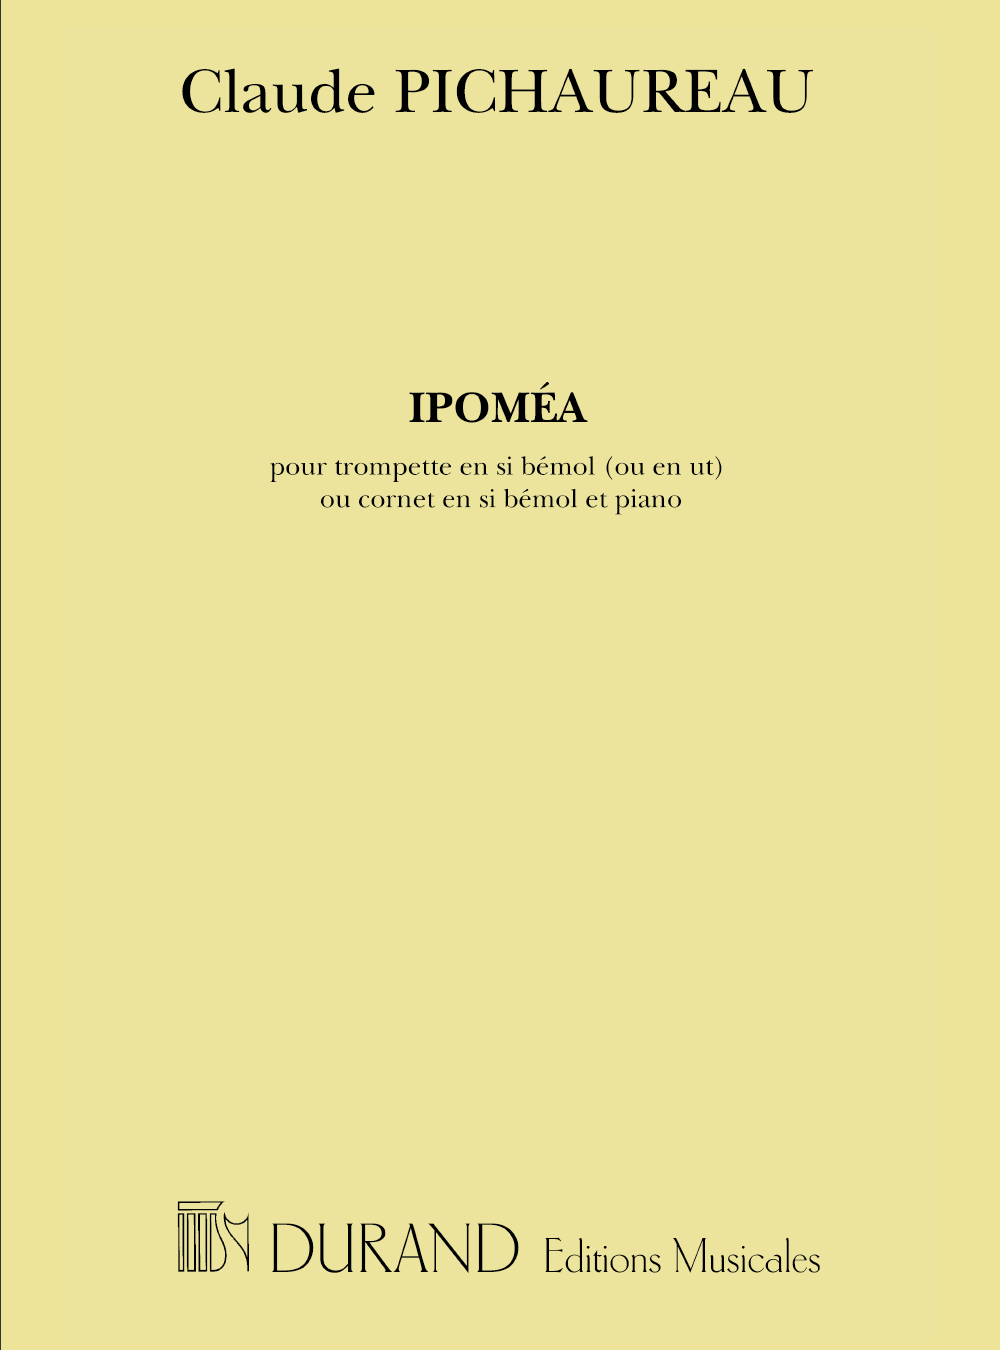 Claude Pichaureau: Ipomea Trompette-Piano: Trumpet